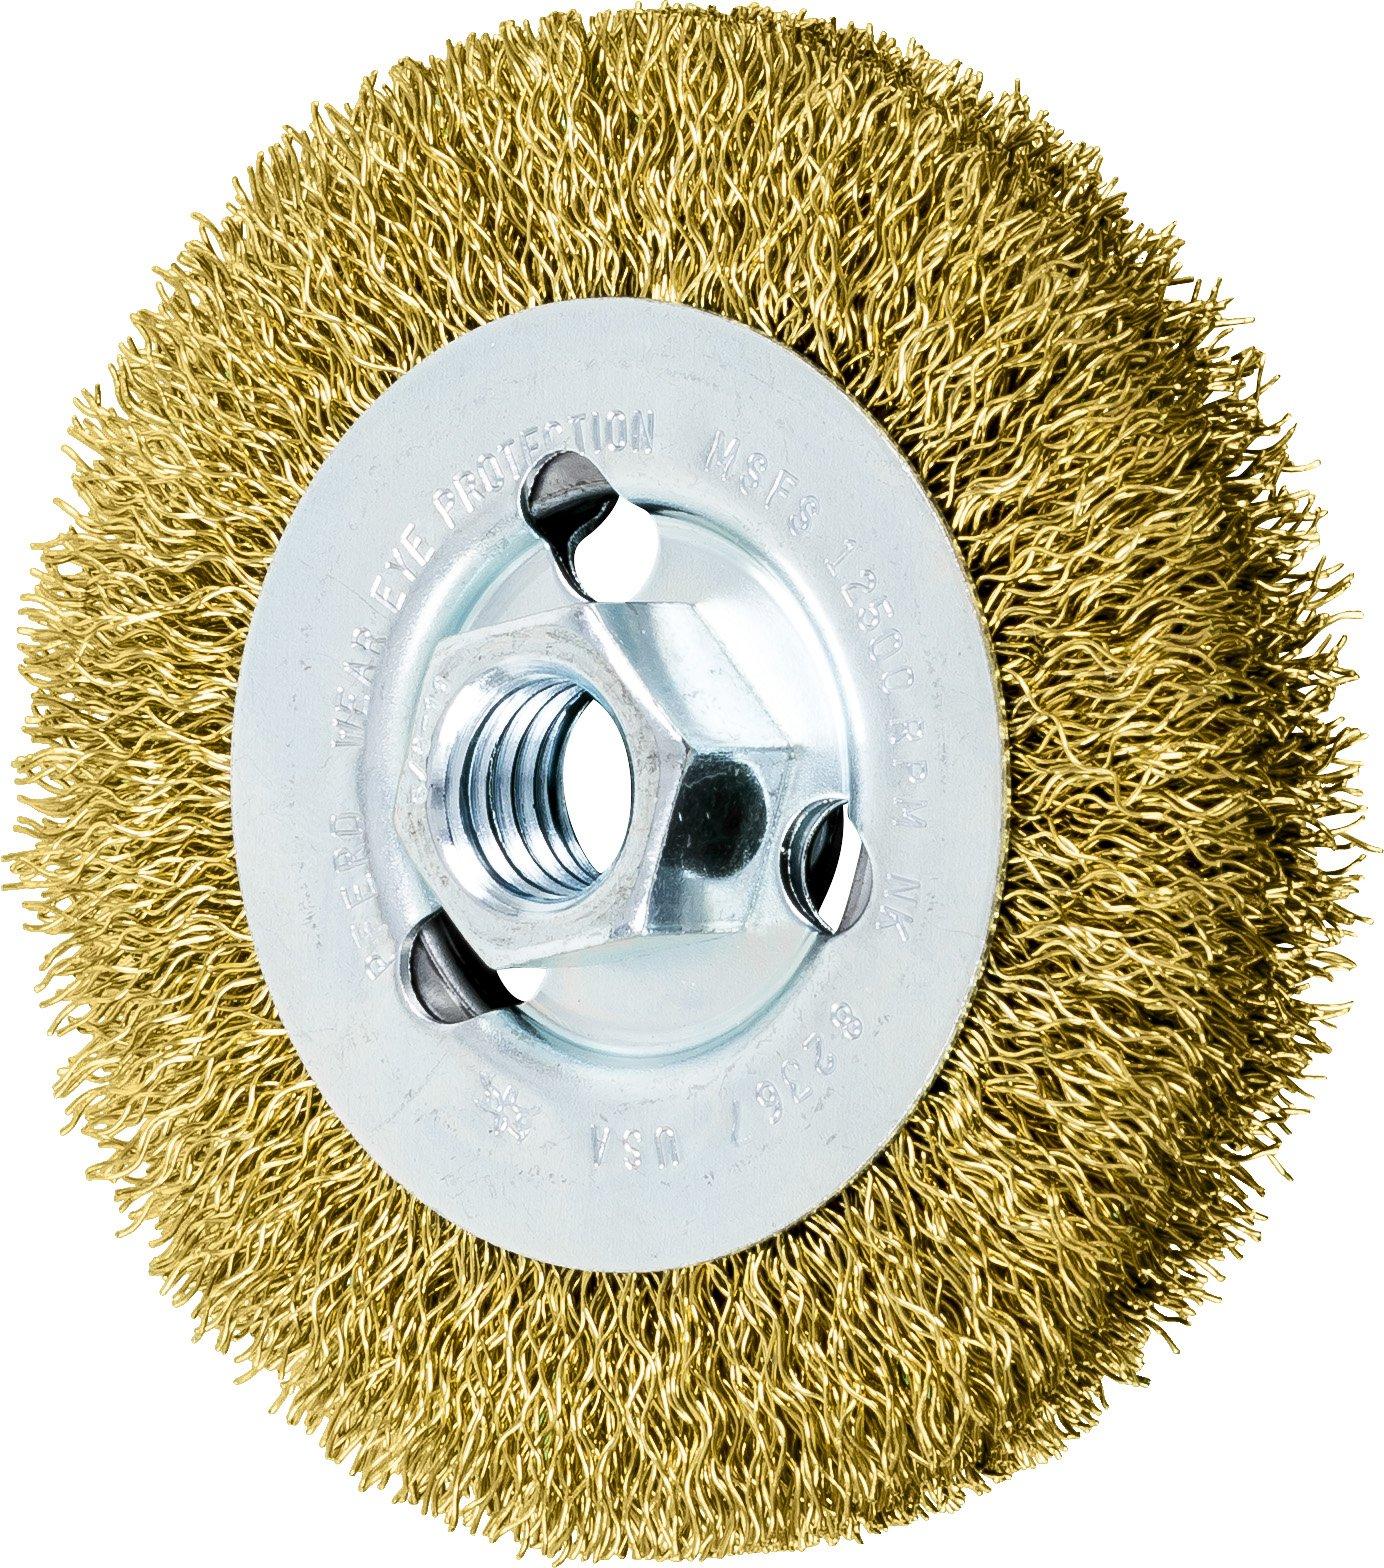 PFERD 82367 Crimped Wheel Brush, Brass Wire, 4'' Diameter, 5/8-11 Thread, 0.012 Wire Size, 11/16'' Trim Length, 1/2'' Face Width, 12500 RPM by Pferd